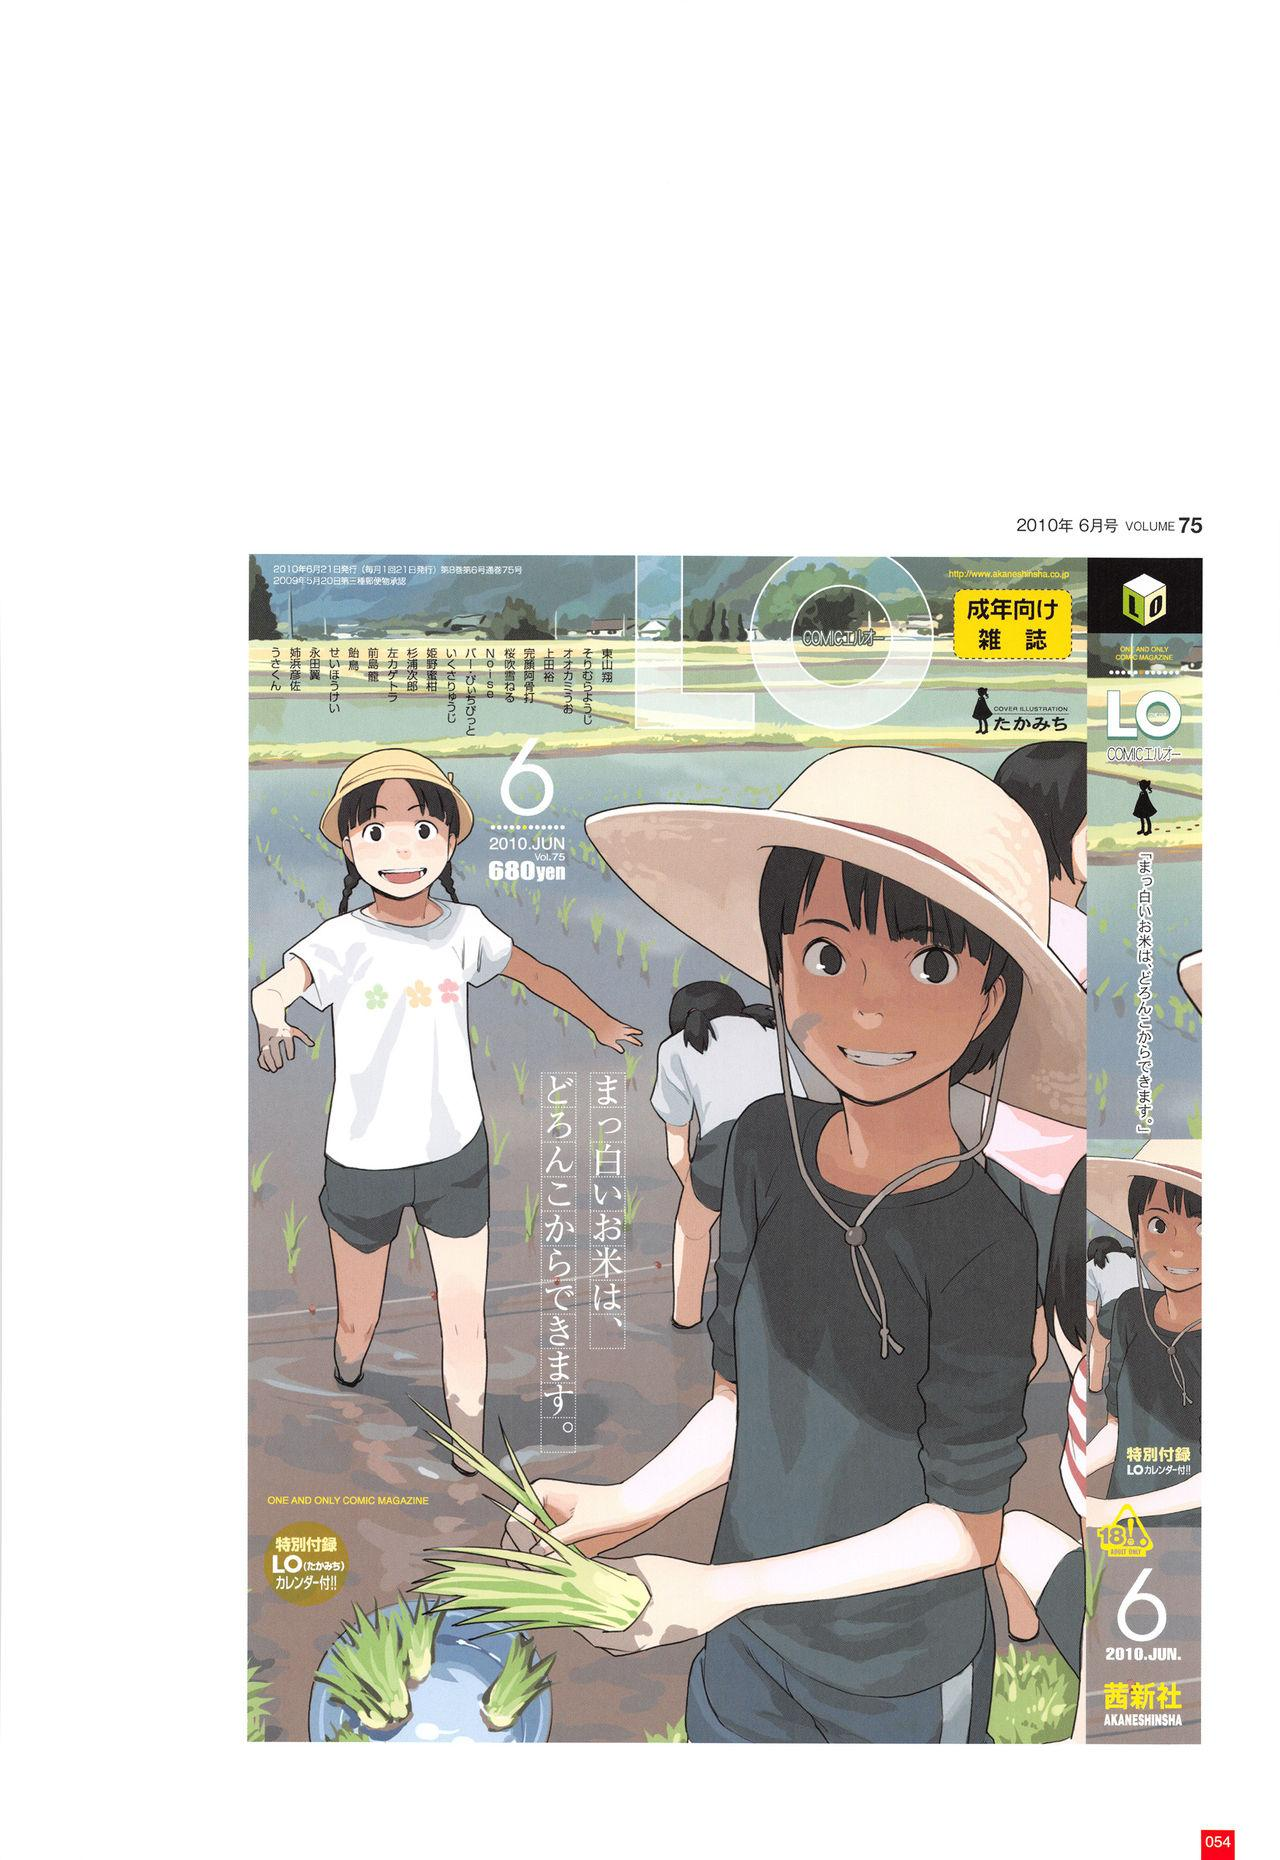 LO Artbook 2-A TAKAMICHI LOOP WORKS 56